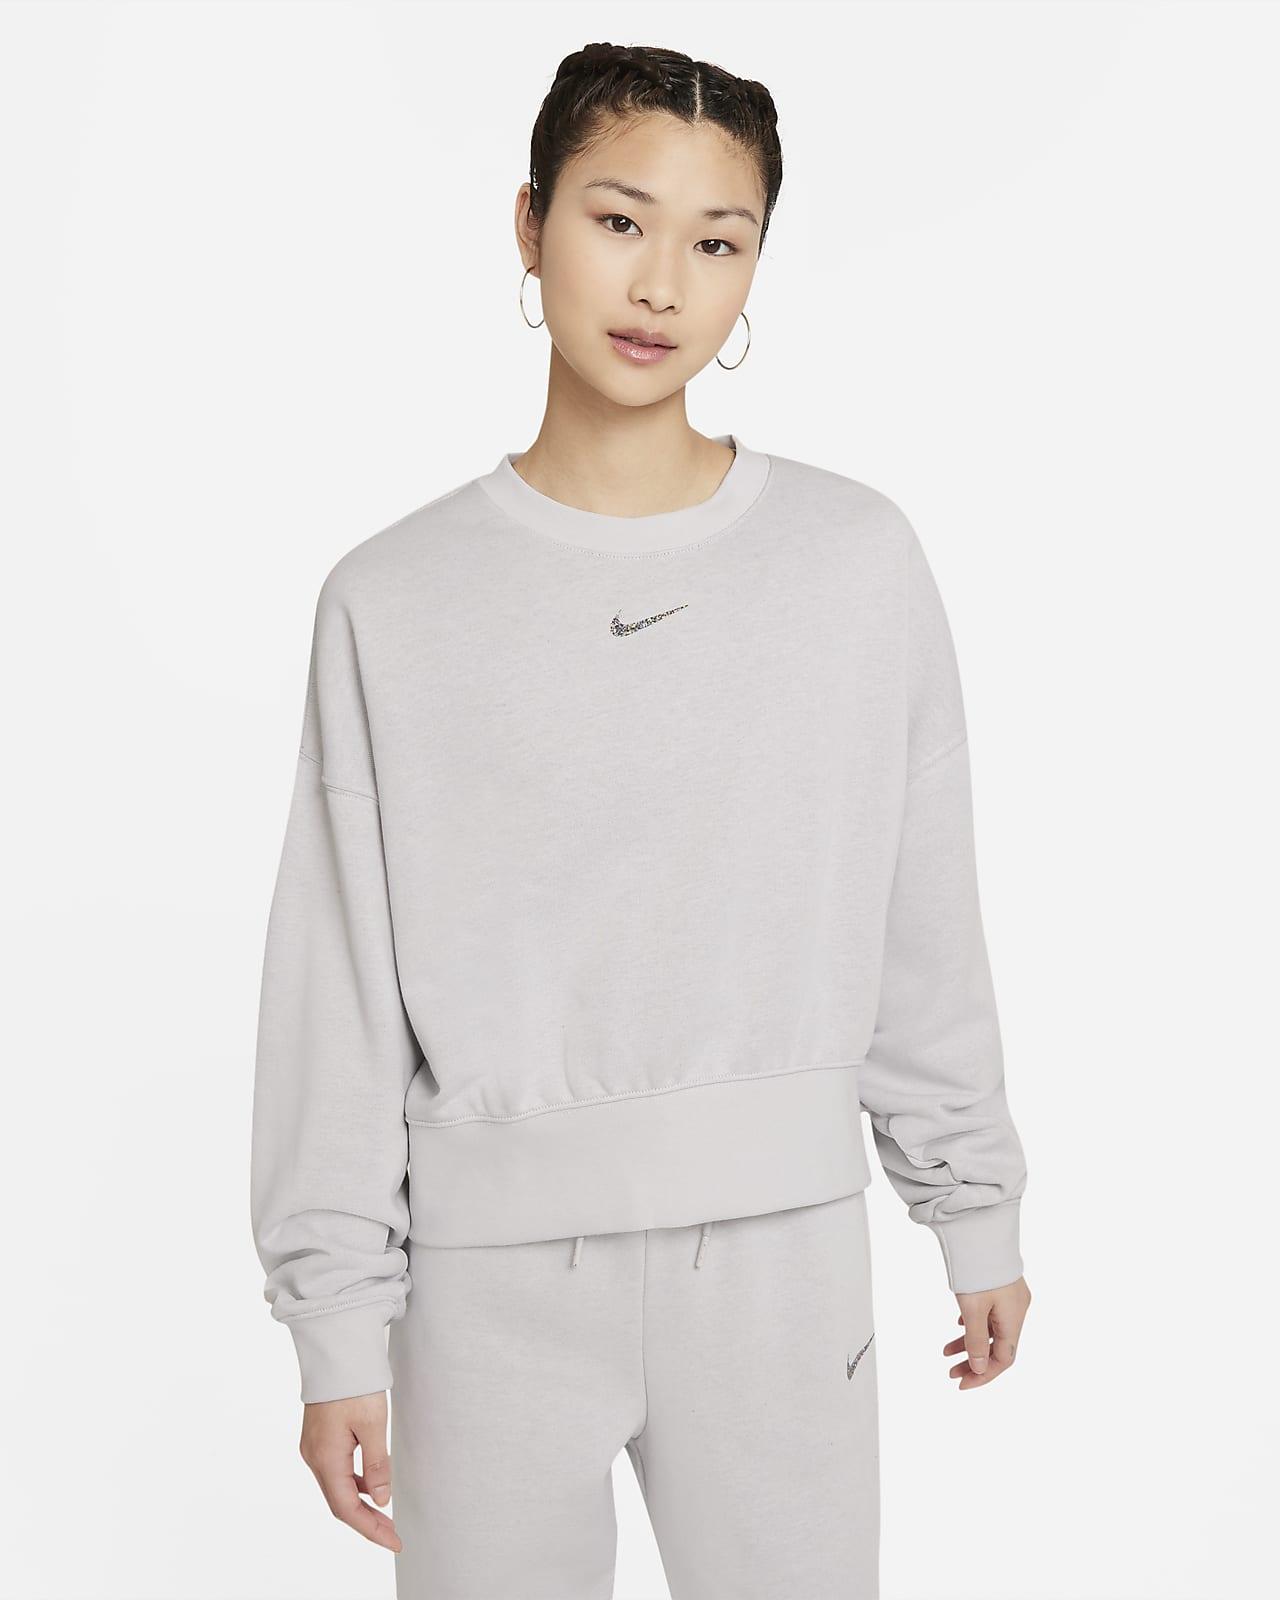 Nike Sportswear Collection Essentials 女子针织圆领上衣